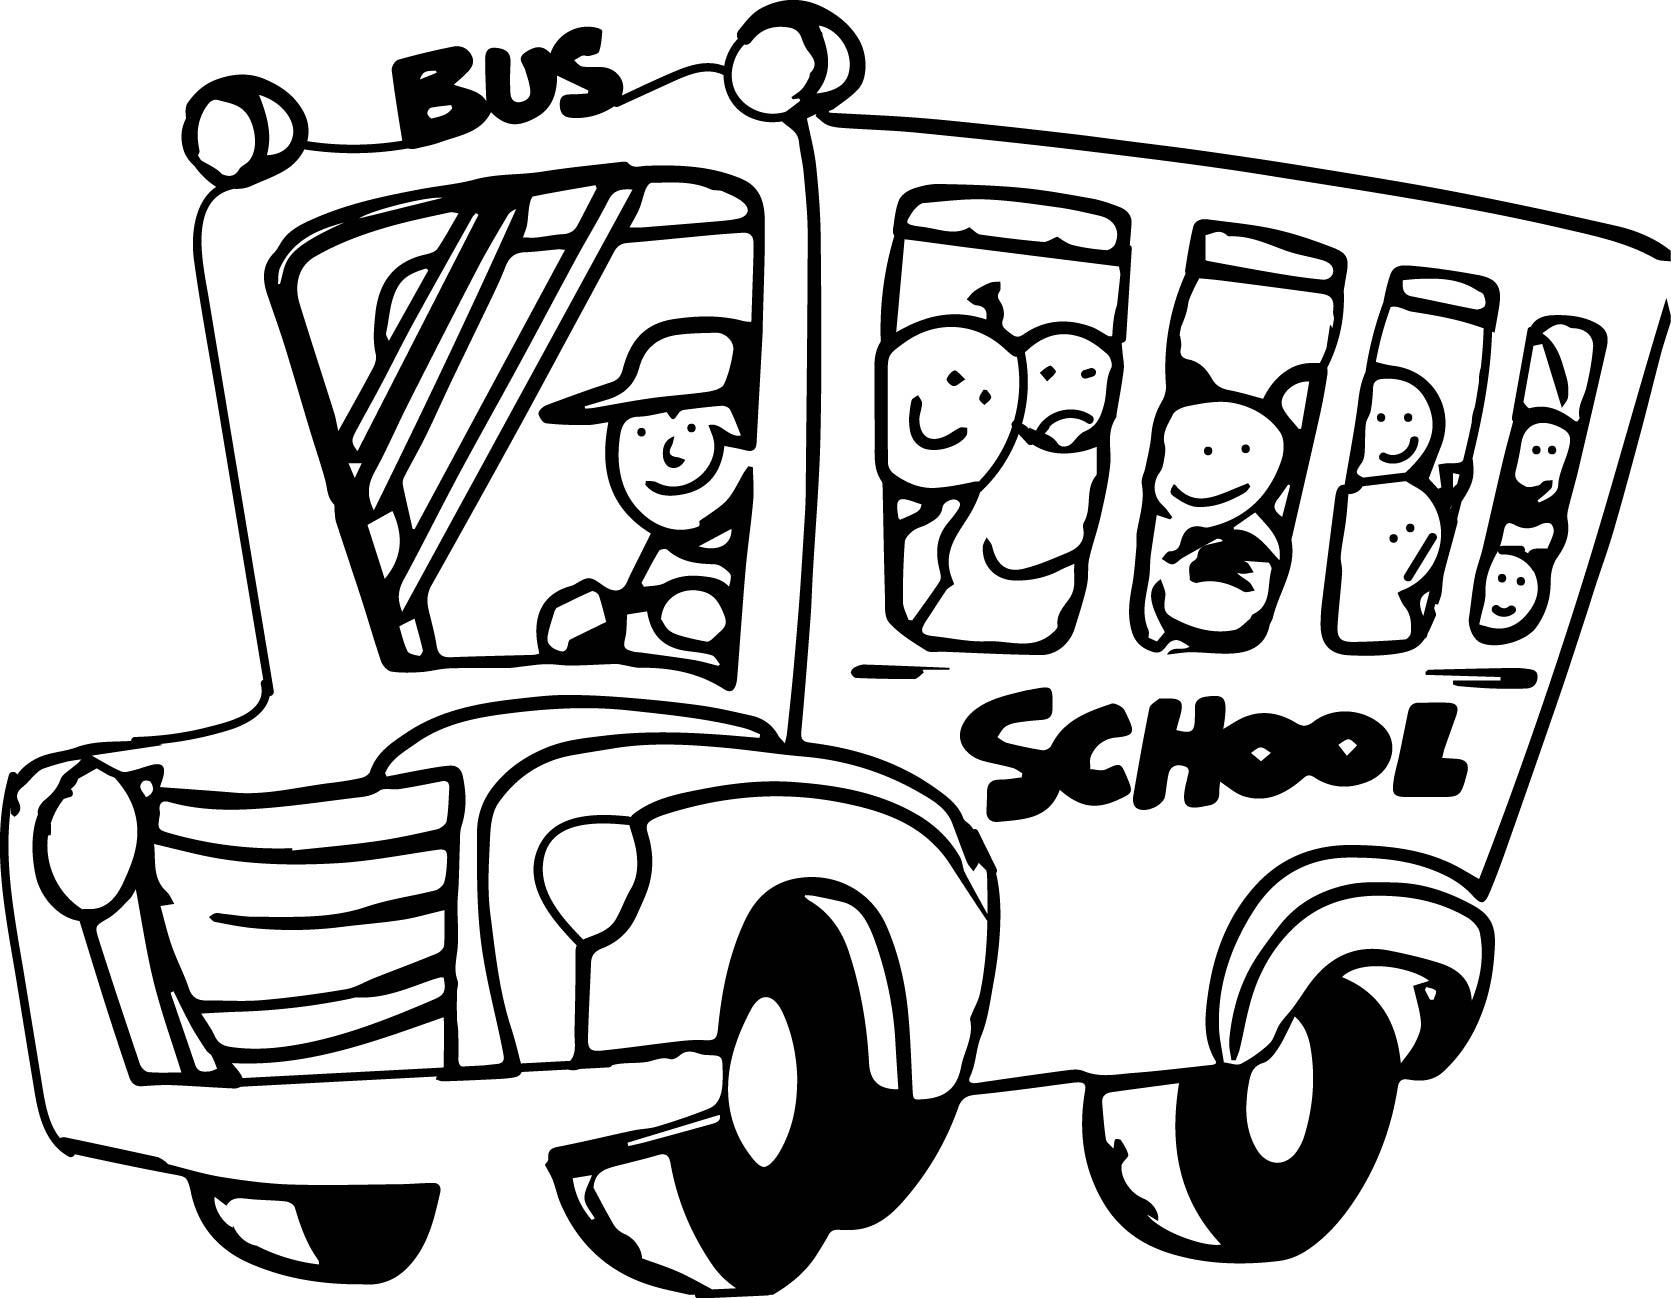 School Bus Coloring Page for Kindergarten